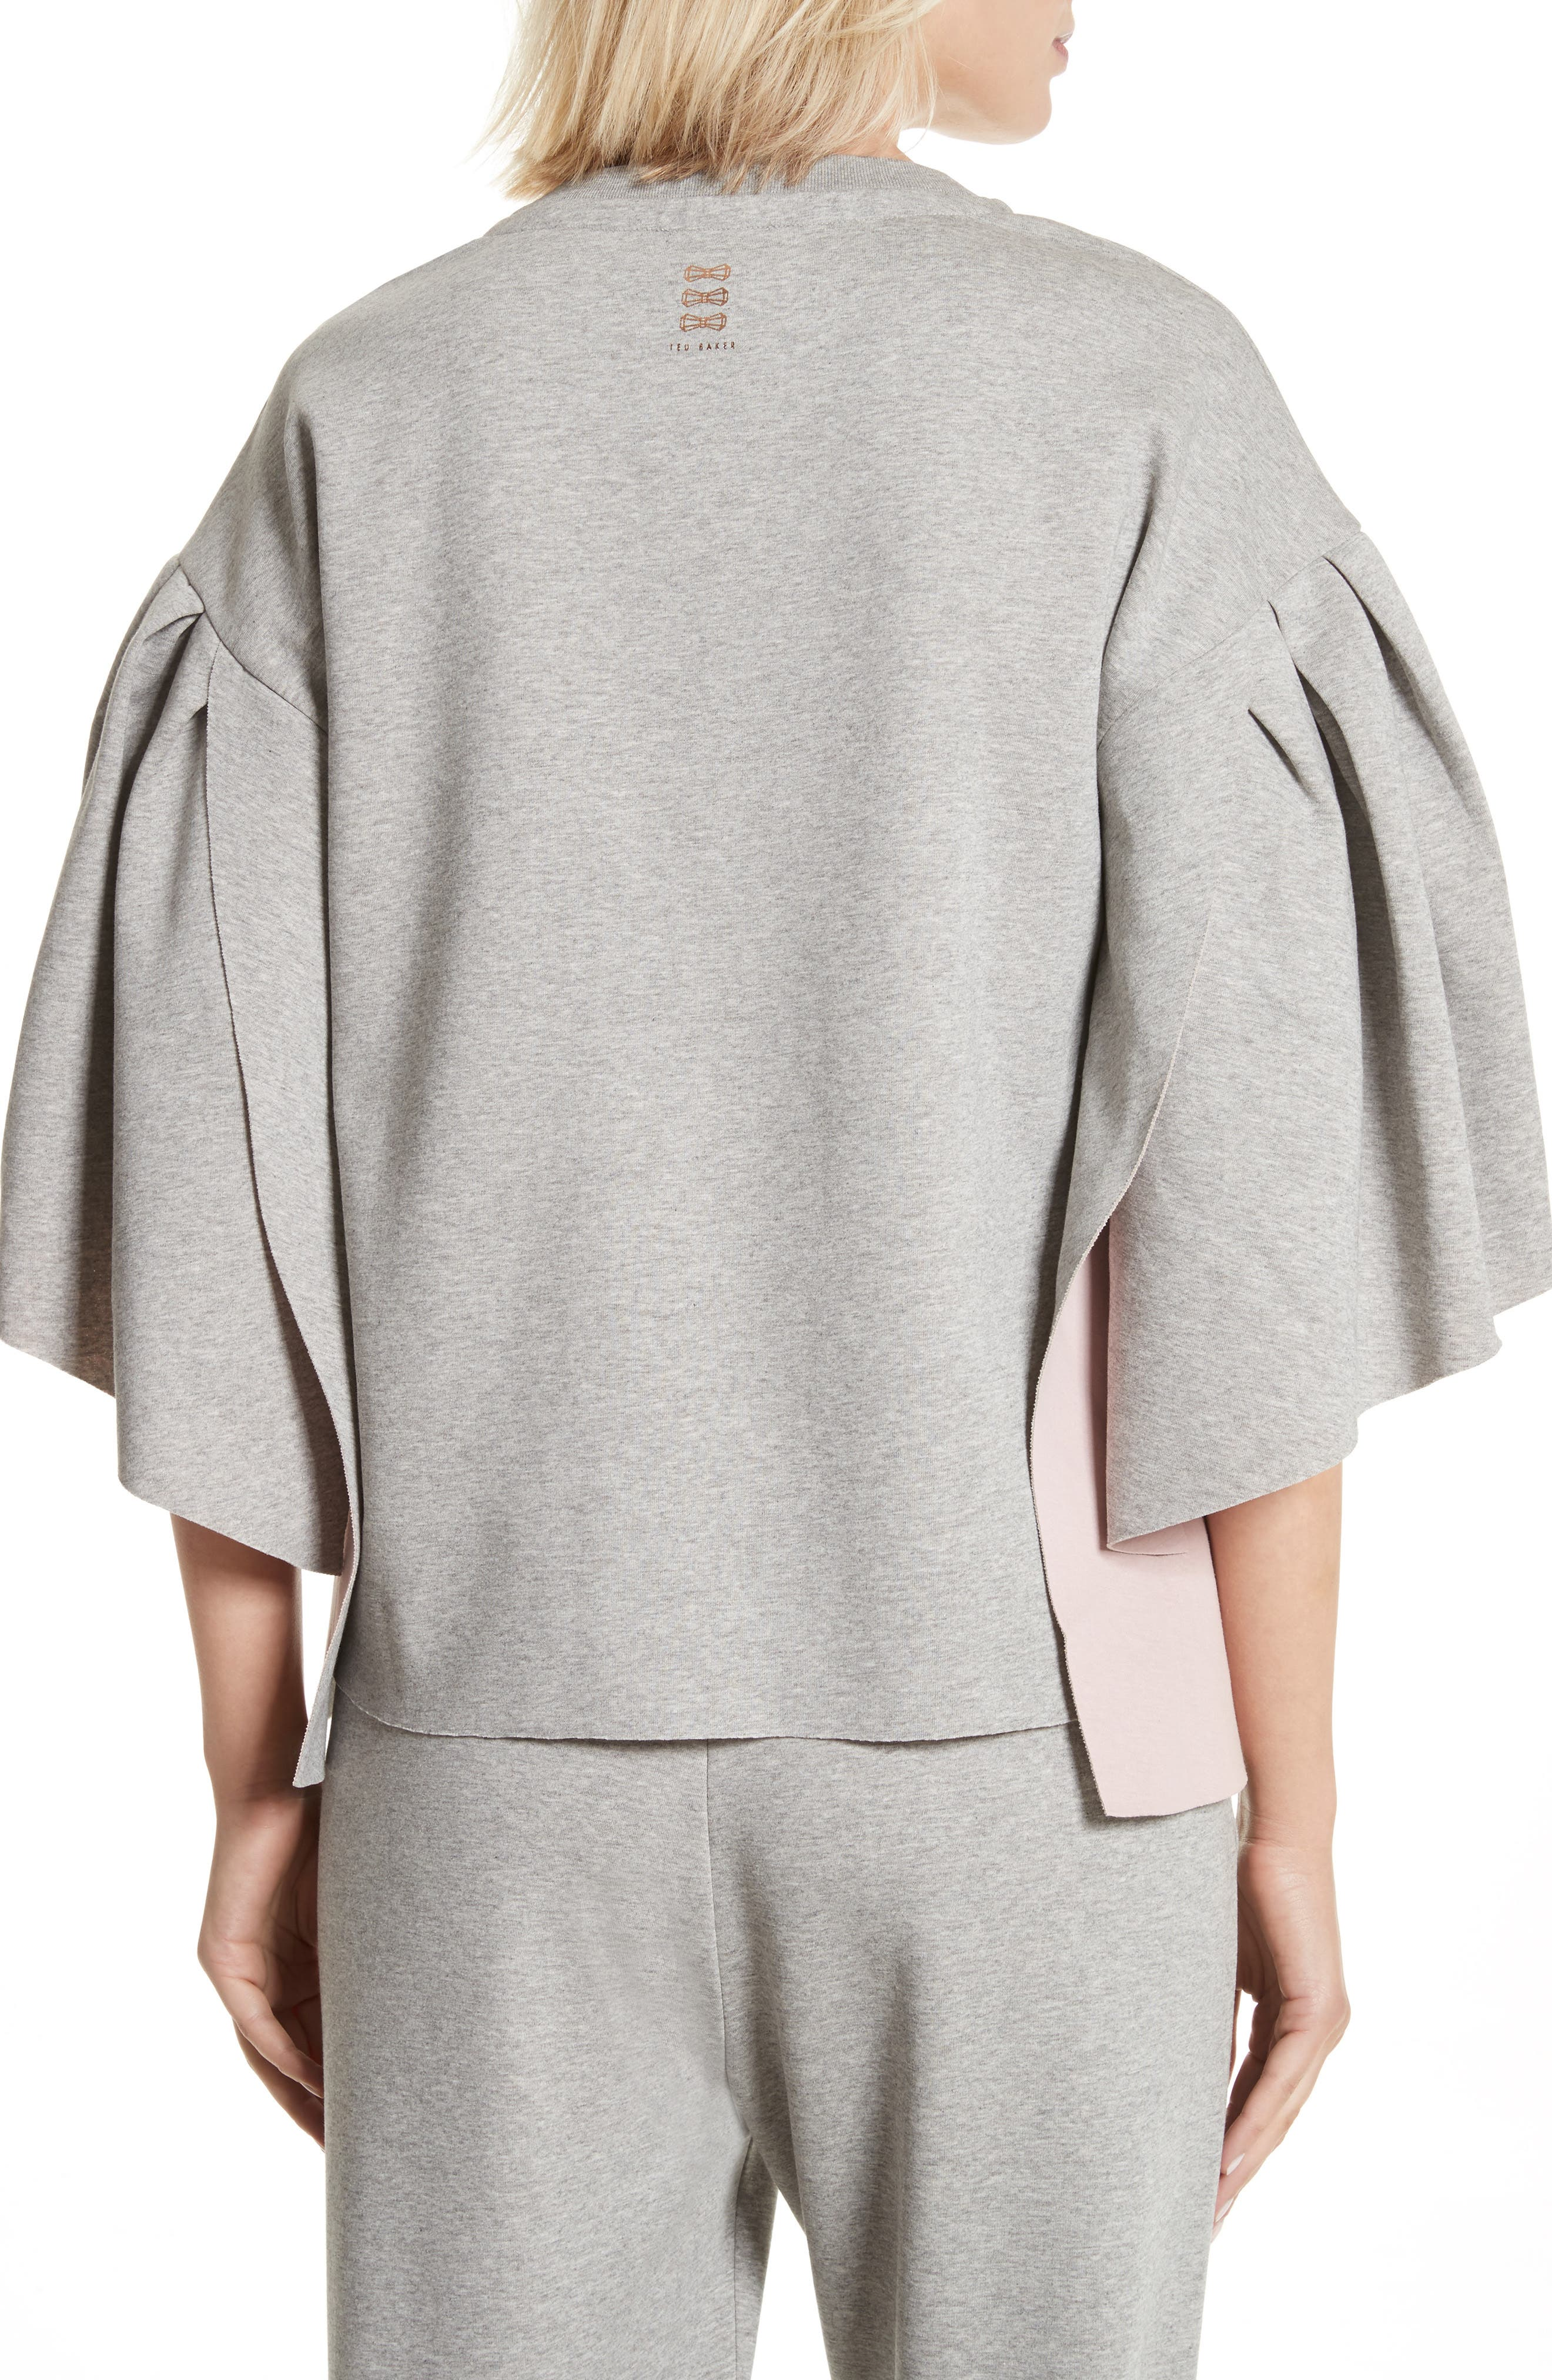 Orcher Full Sleeve Sweatshirt,                             Alternate thumbnail 5, color,